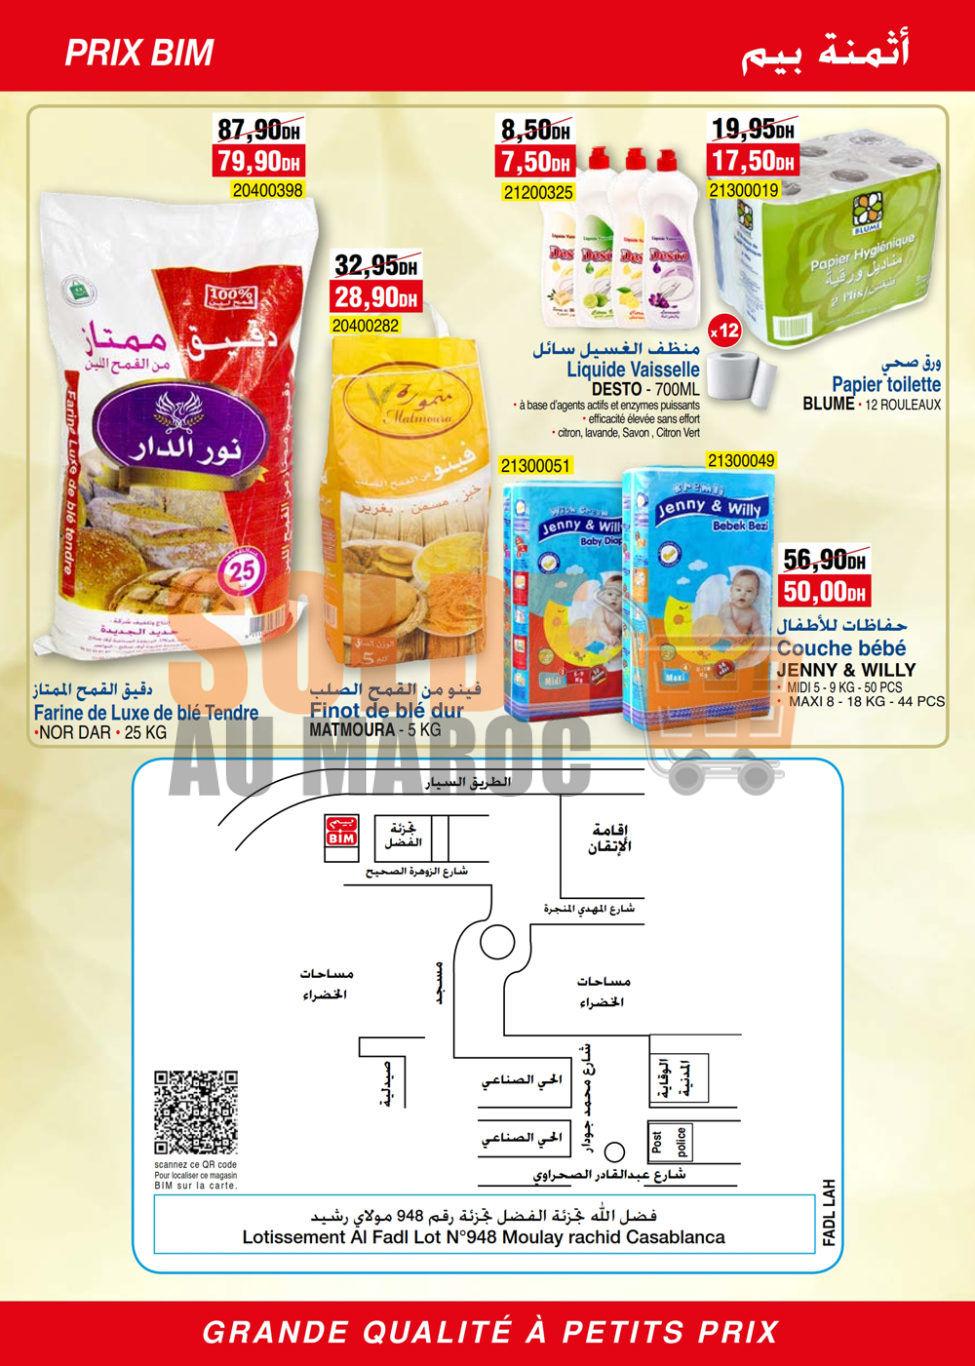 Catalogue Bim Al Fadl Casablanca du 15 au 17 Mars 2019